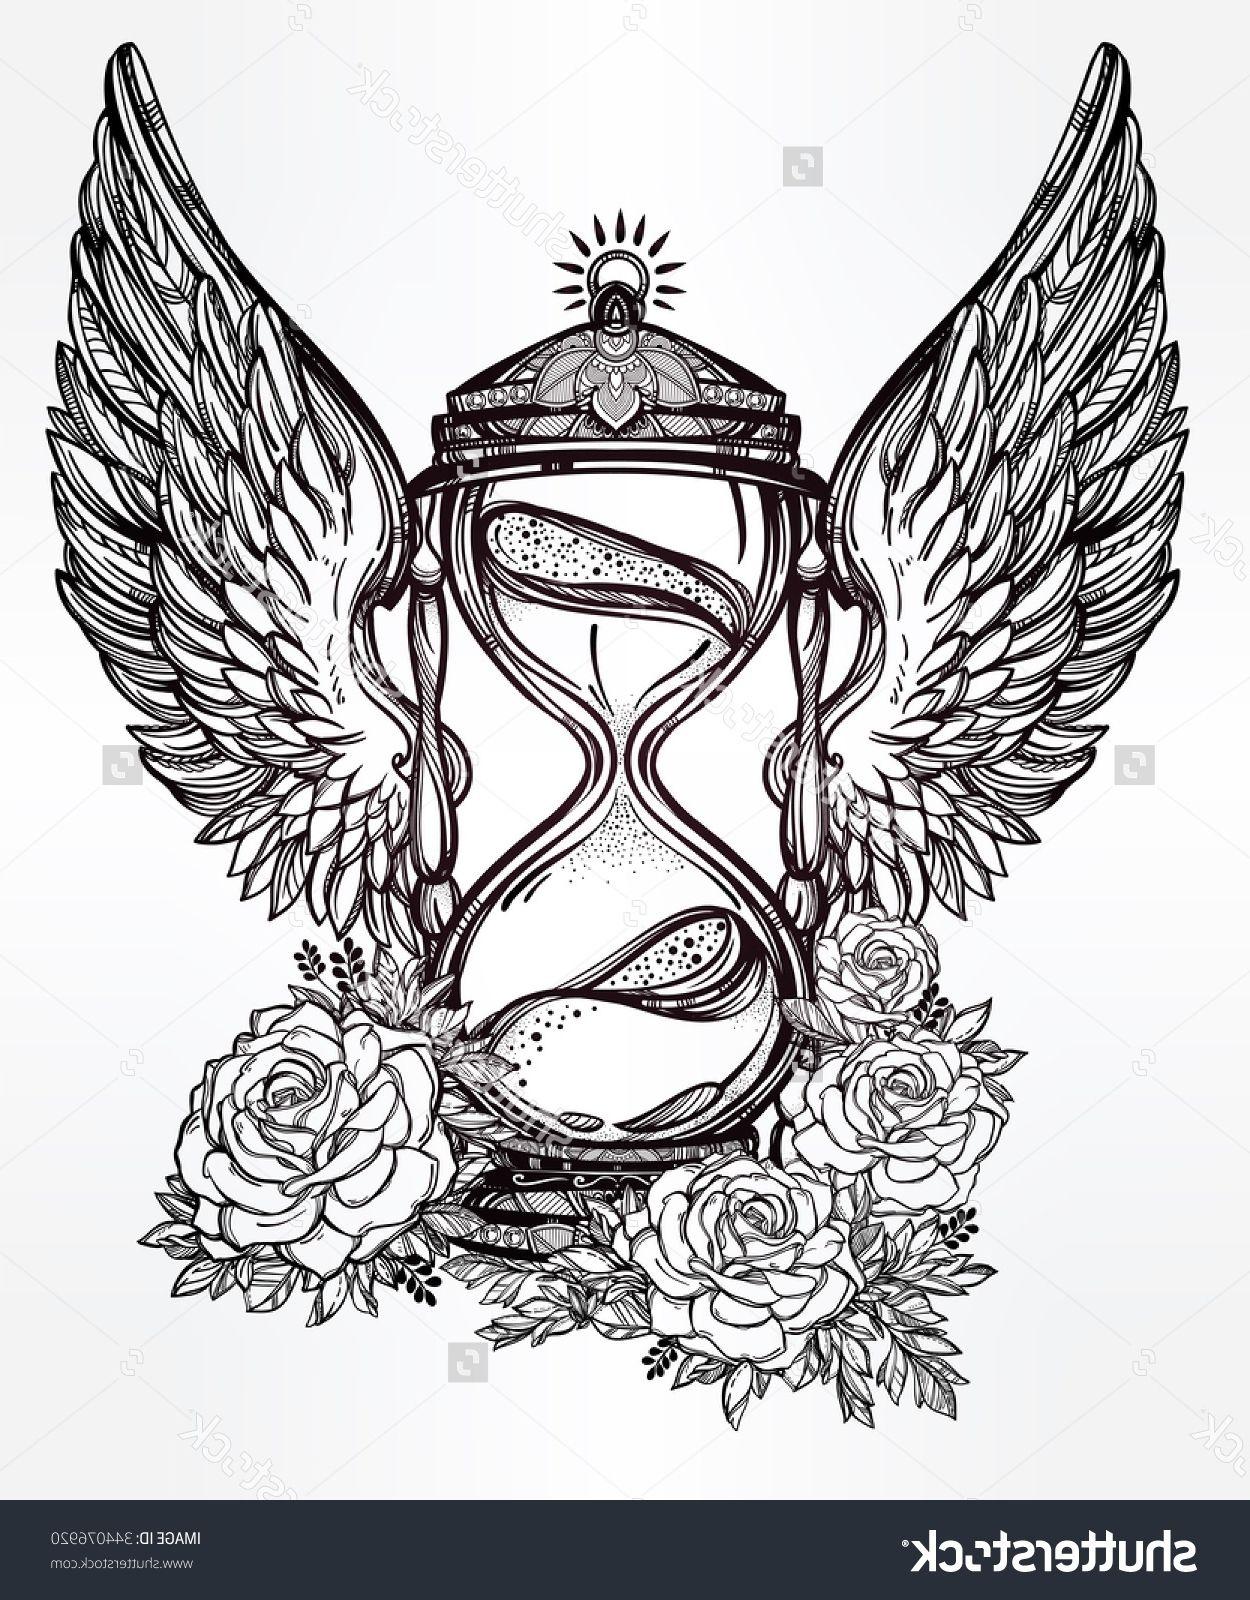 Hand drawn tattoo designs hand drawn romantic beautiful drawing of hand drawn romantic beautiful drawing of a hourglass tattoo design mystic time symbol for your use comprar estea imagem vetorial de banco no biocorpaavc Images